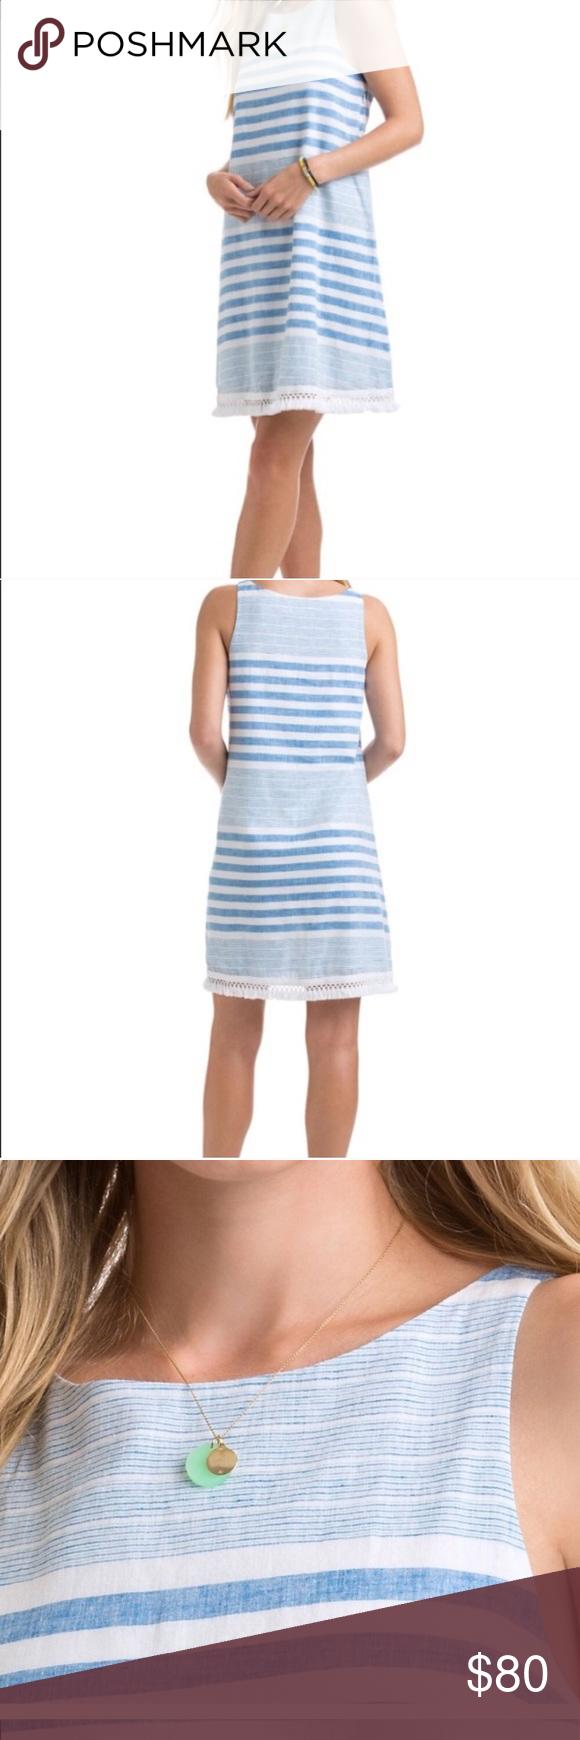 Nwt Vineyard Vines Vineyard Stripe Dress Size 4 Nwt Blue And White Strip Dress From Vineyard Vines A Line Relaxed Fit Shift Dre Striped Dress Fashion Dresses [ 1740 x 580 Pixel ]